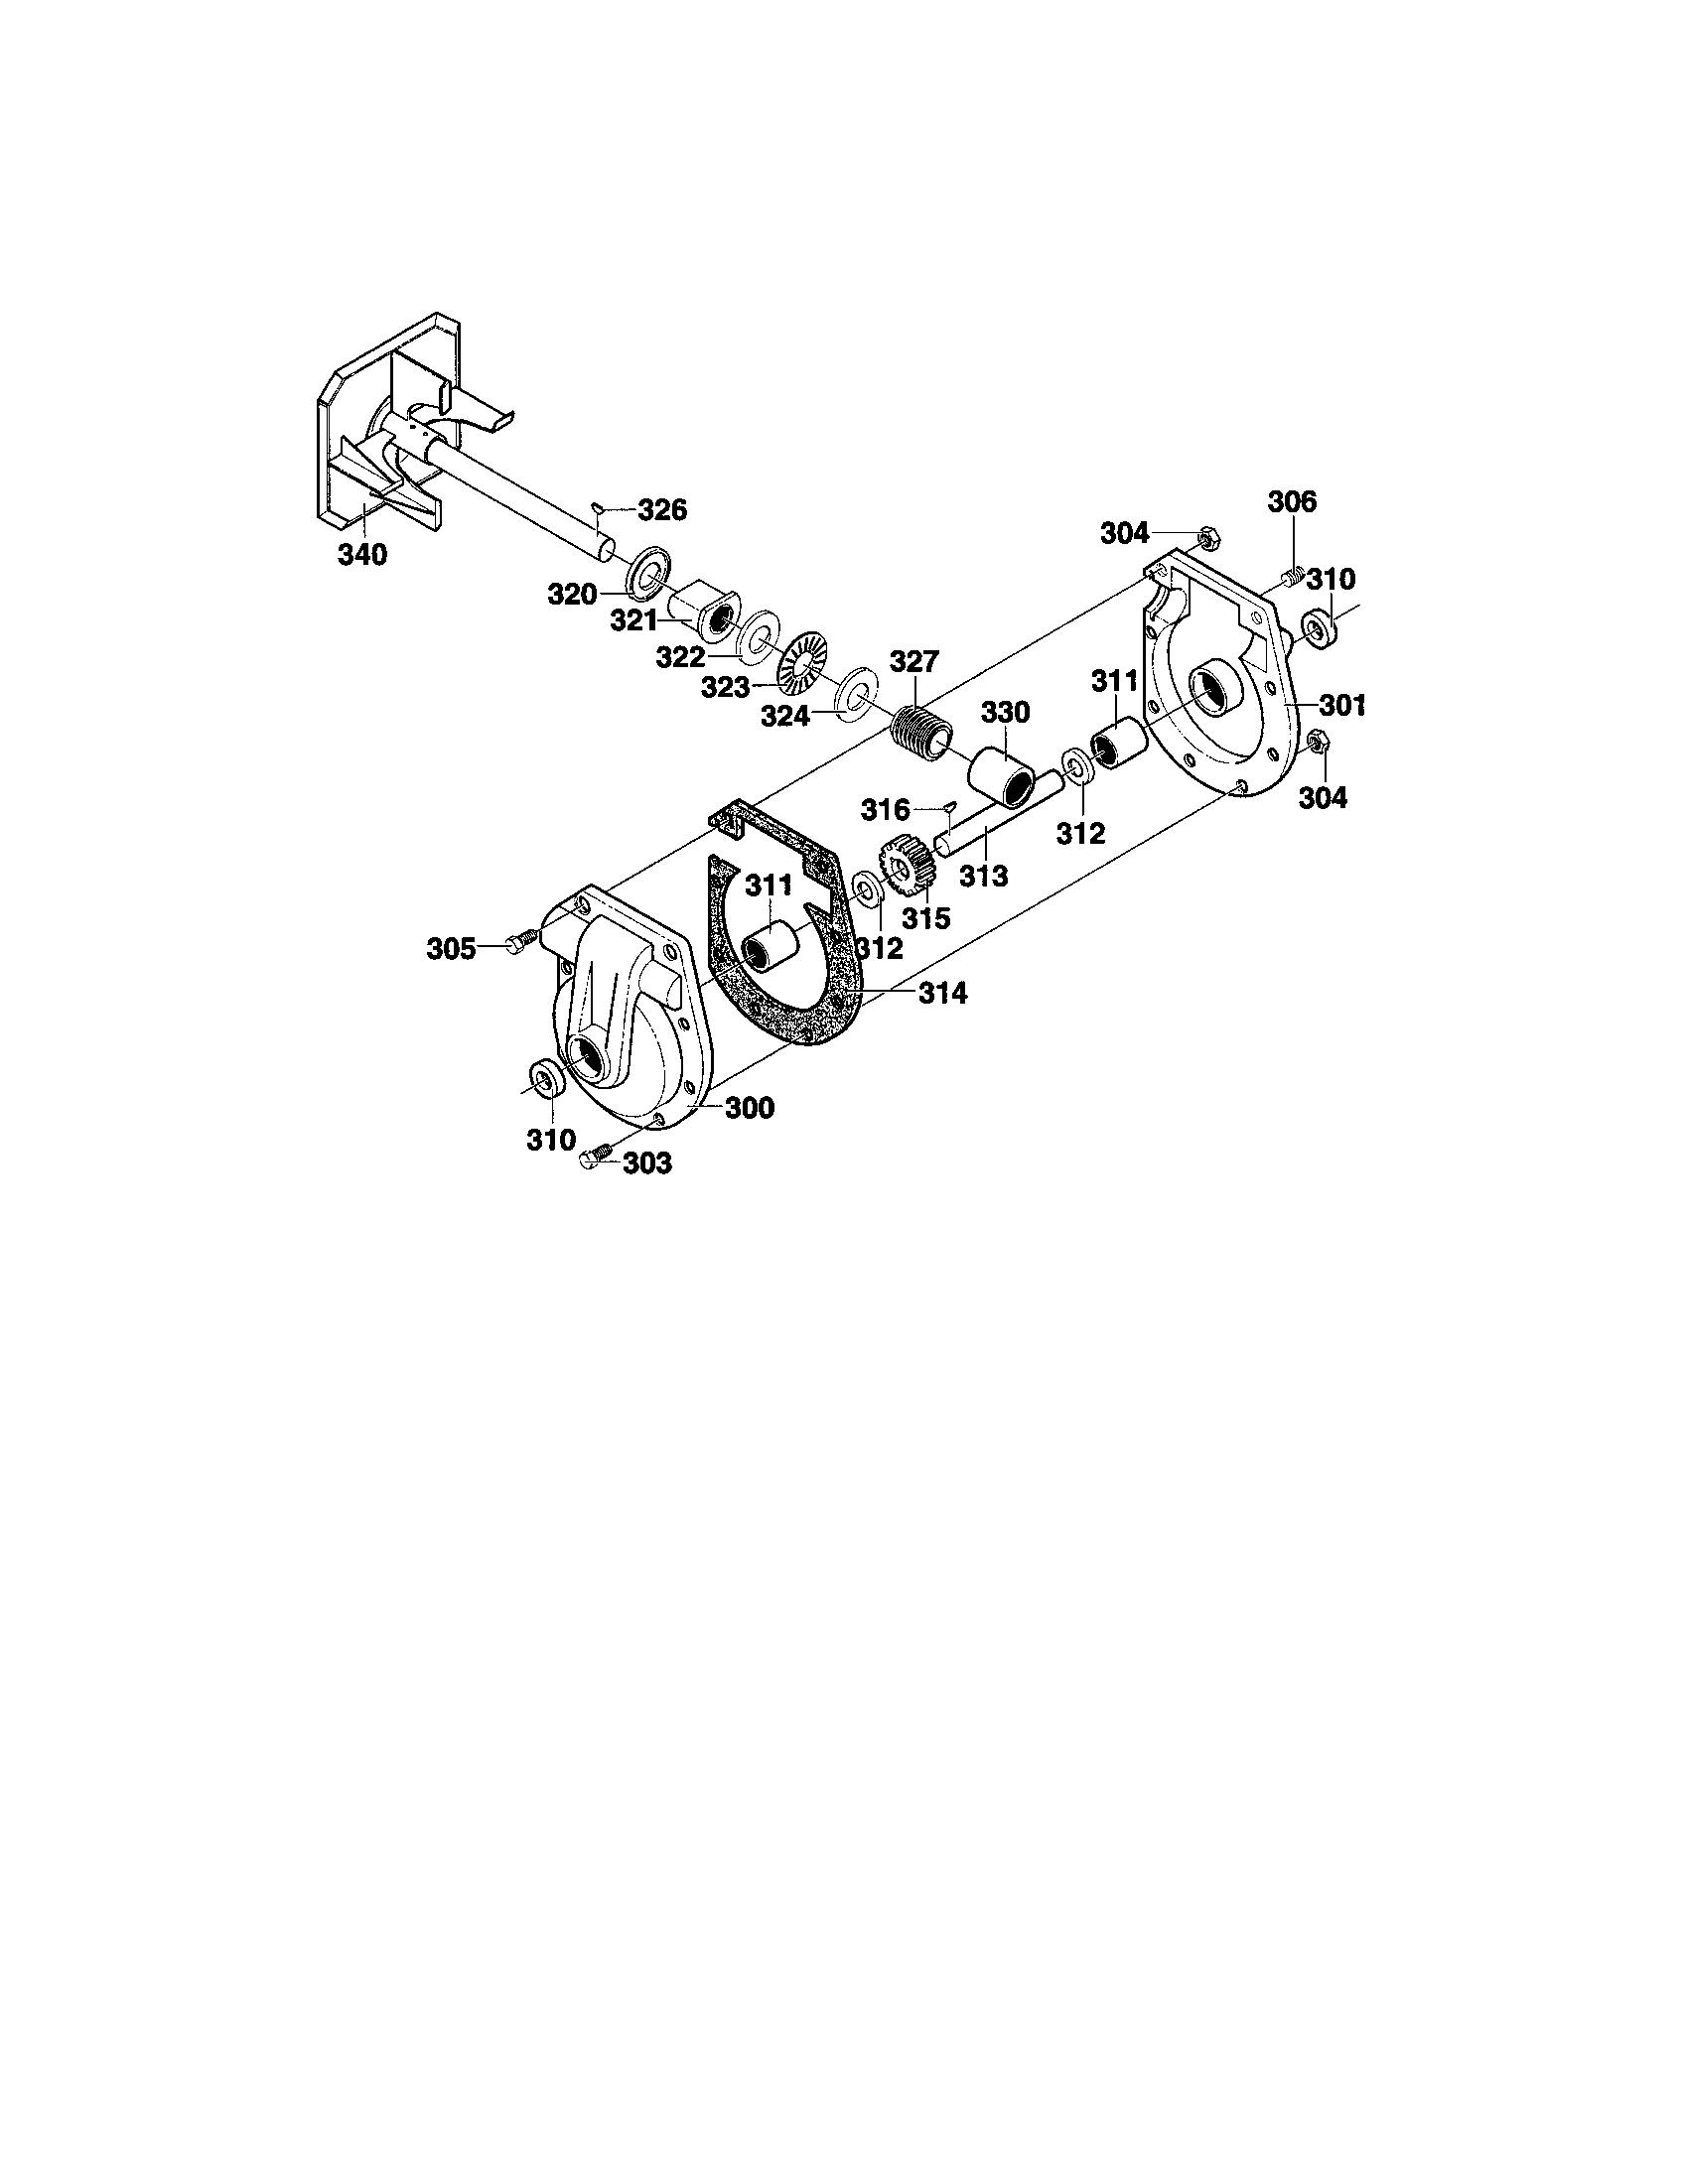 Craftsman model 536886480 snowthrower, gas genuine parts